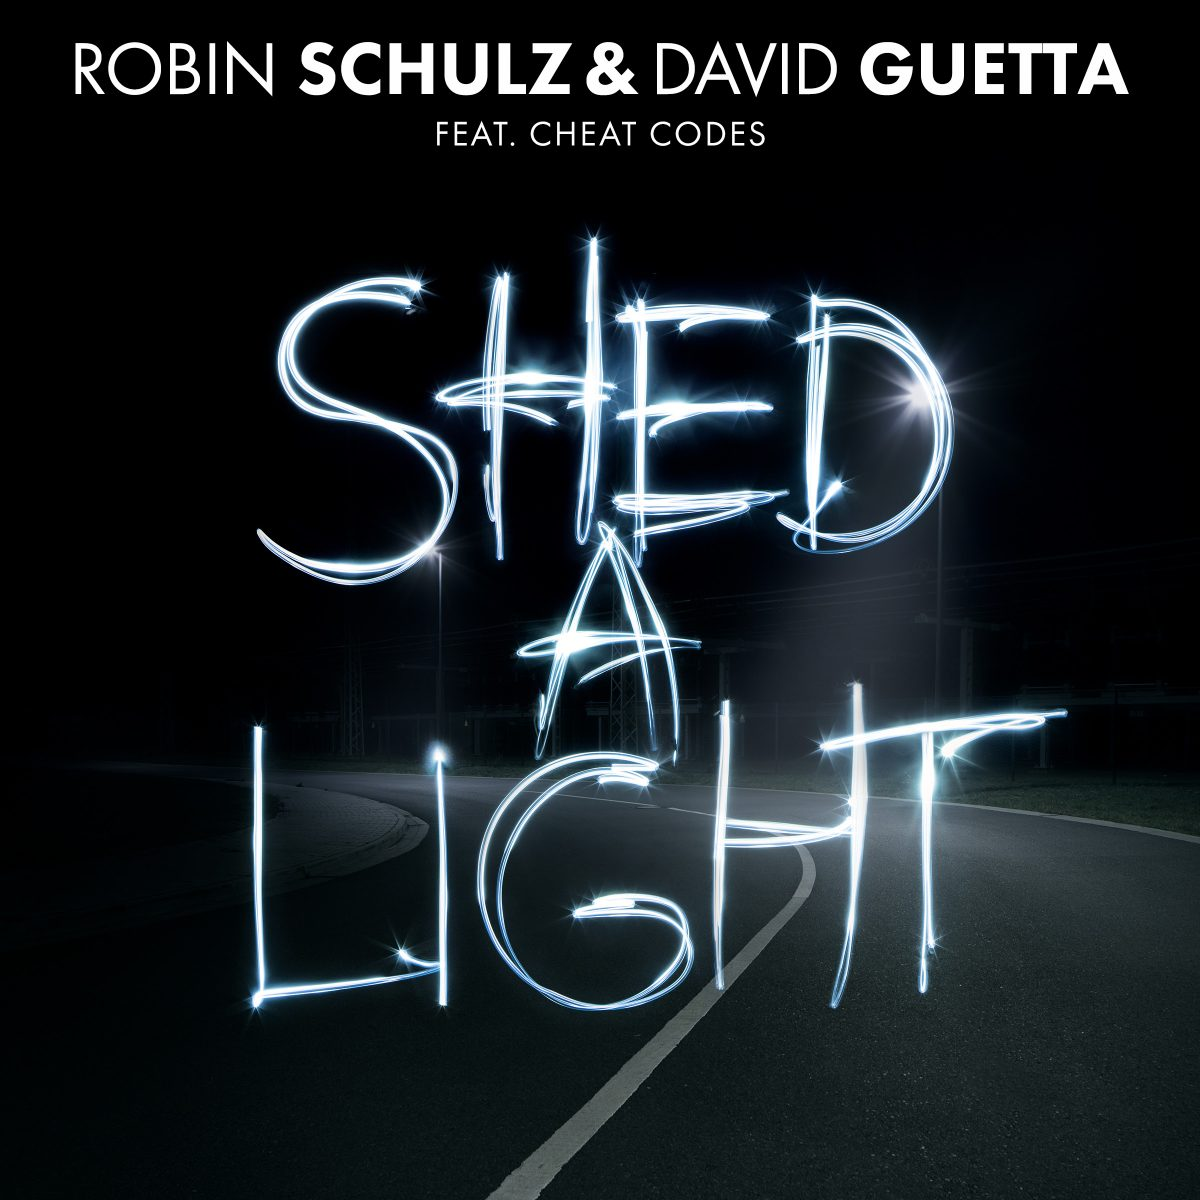 robin-Schulz-David-Guetta-Shed-a-light-EDMred David Guetta y Robin Schulz colaboran en 'Shed A Light'